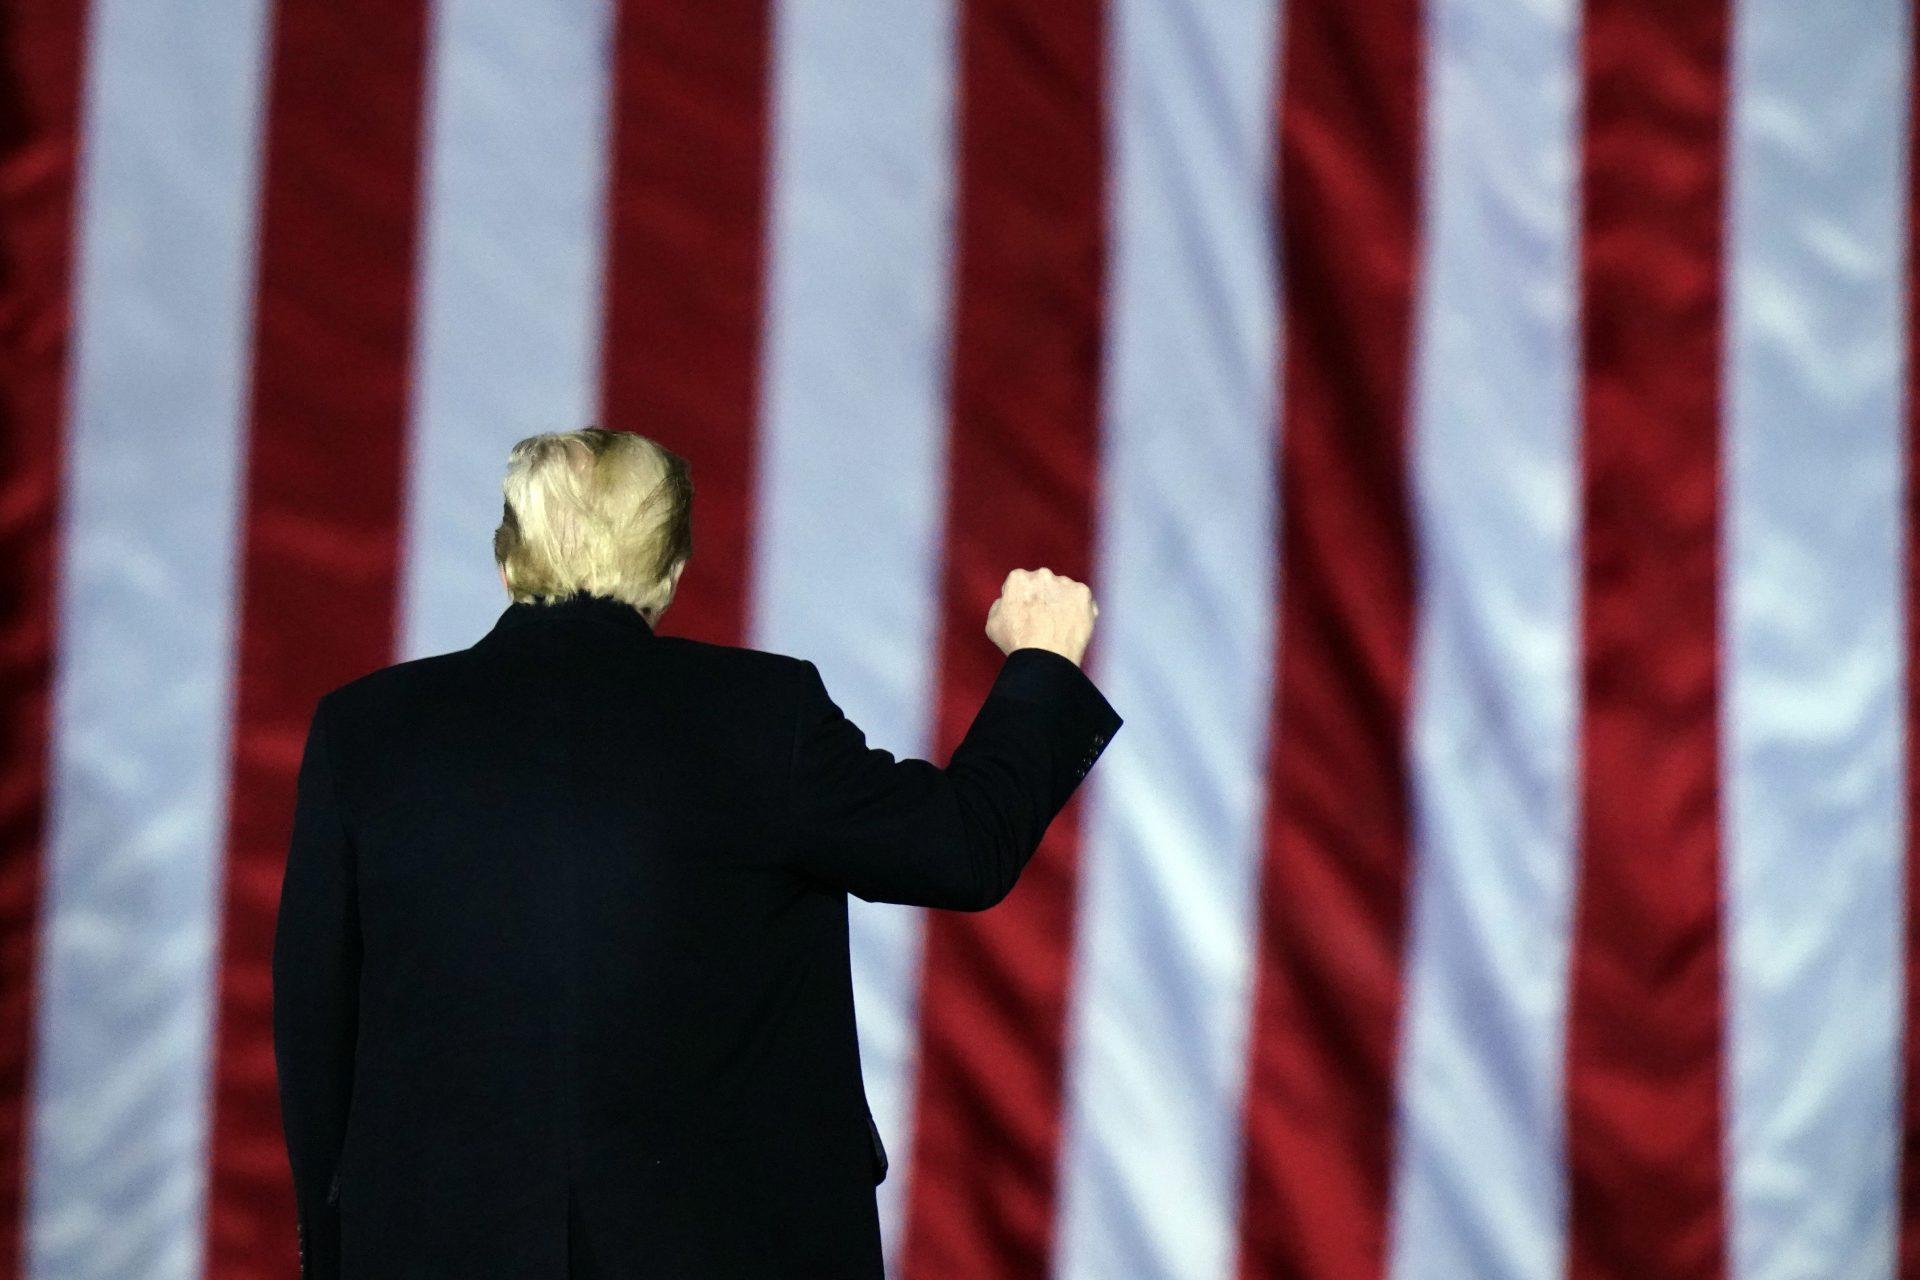 President Donald Trump gestures at a campaign rally in support of U.S. Senate candidates Sen. Kelly Loeffler, R-Ga., and David Perdue in Dalton, Ga., Monday, Jan. 4, 2021.